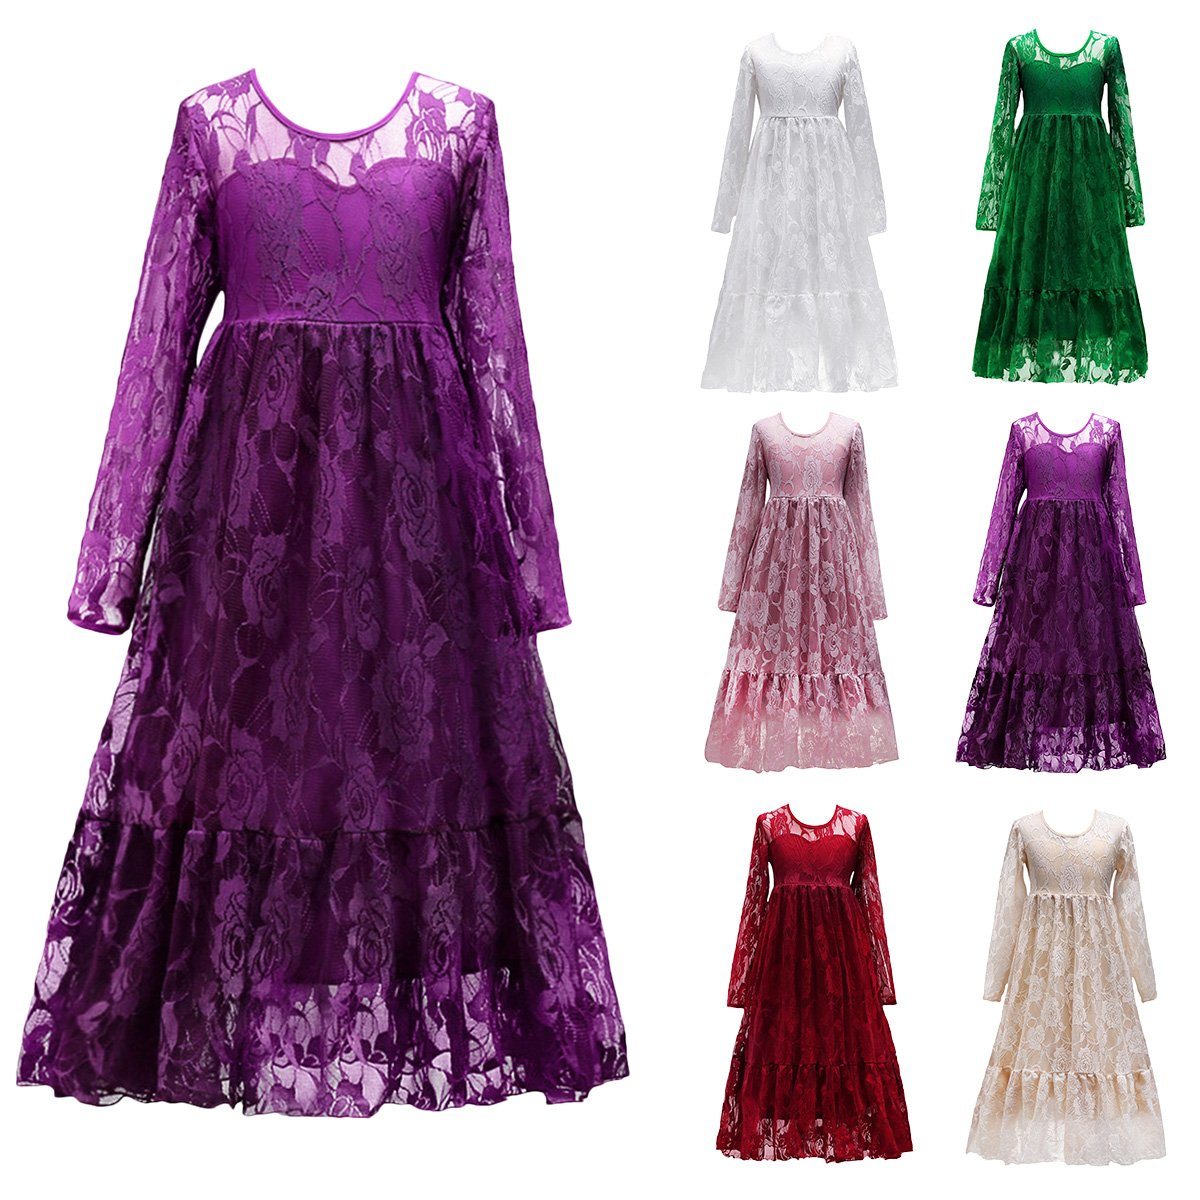 Niños niñas vestido de princesa mangas largas eventos encaje encaje ...